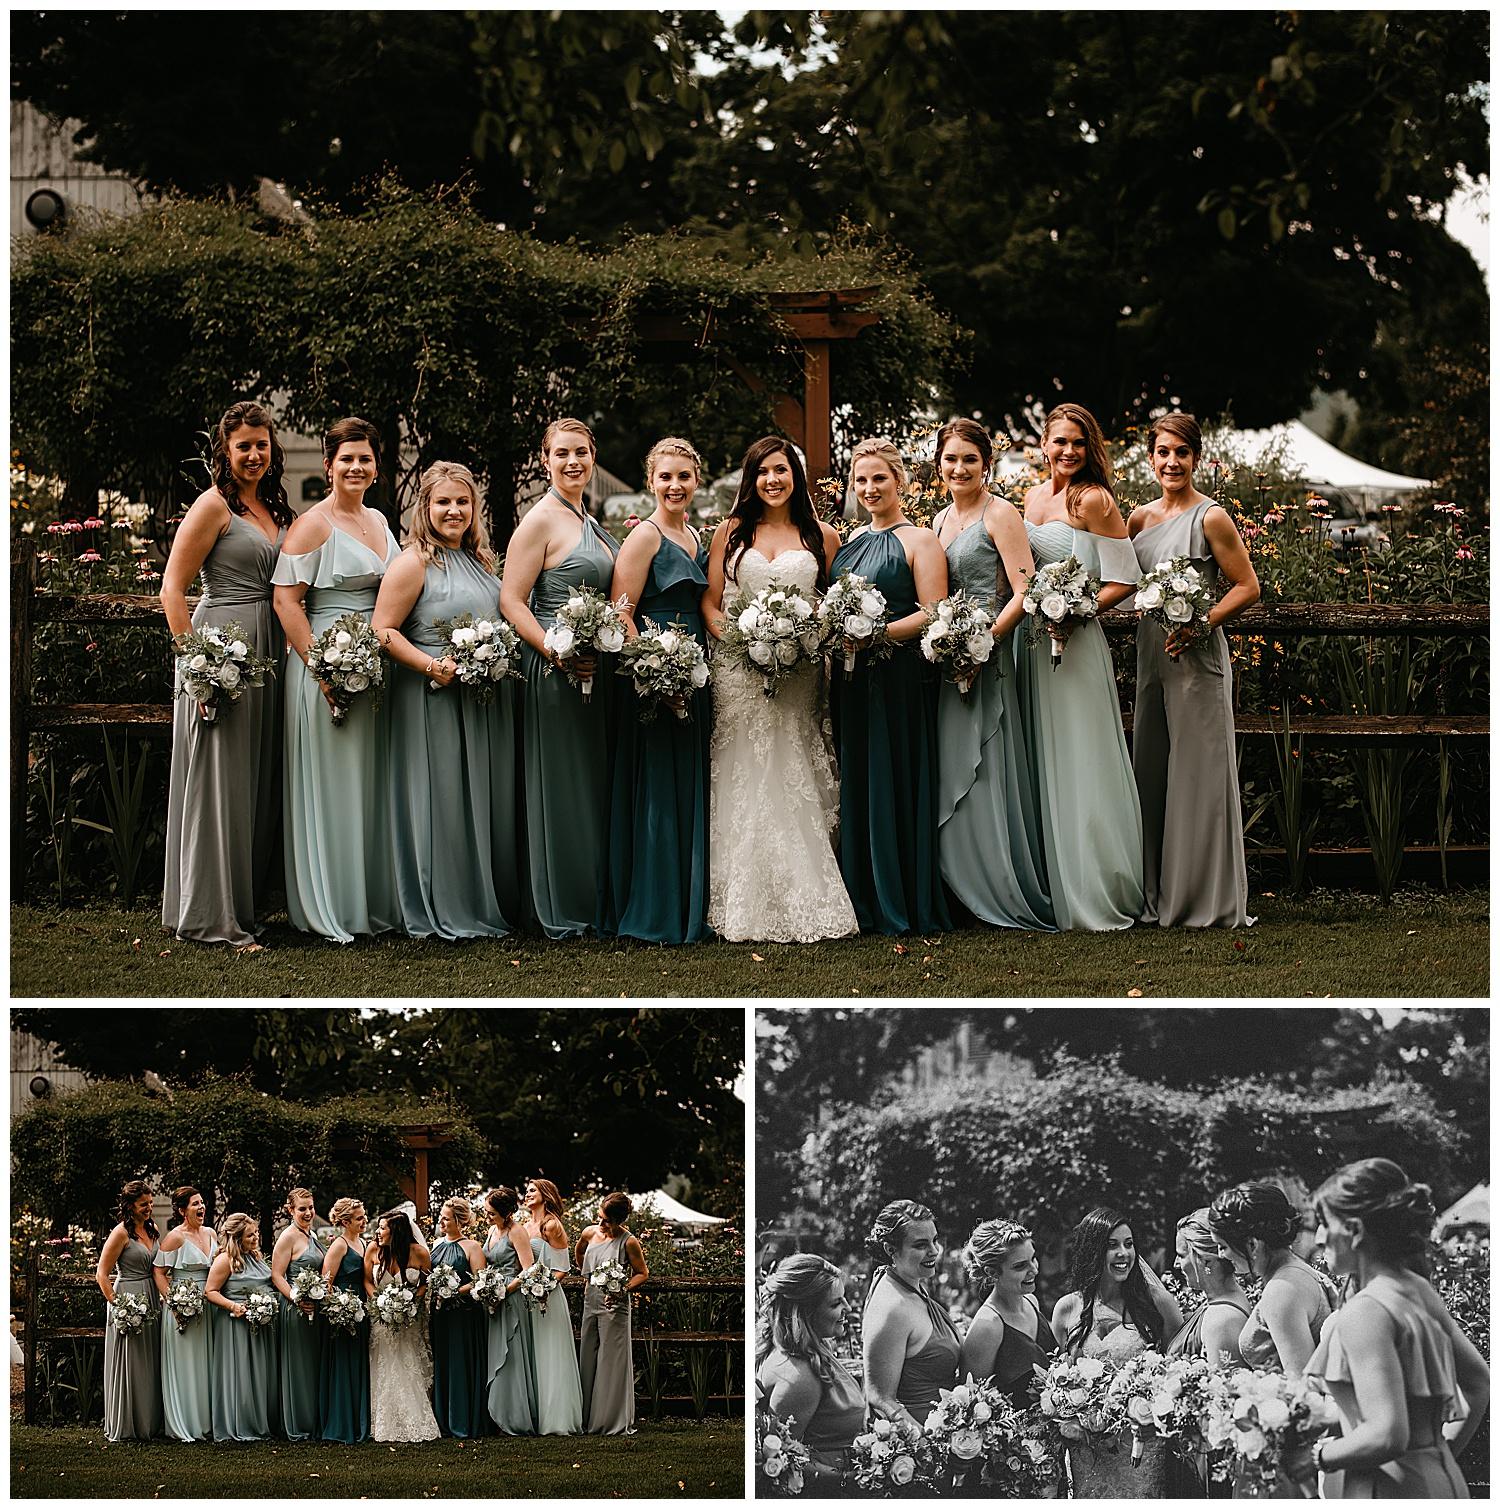 NEPA-Bloomsburg-Wedding-Photographer-at-The-Barn-at-Boones-Dam-Bloomsburg-PA_0030.jpg